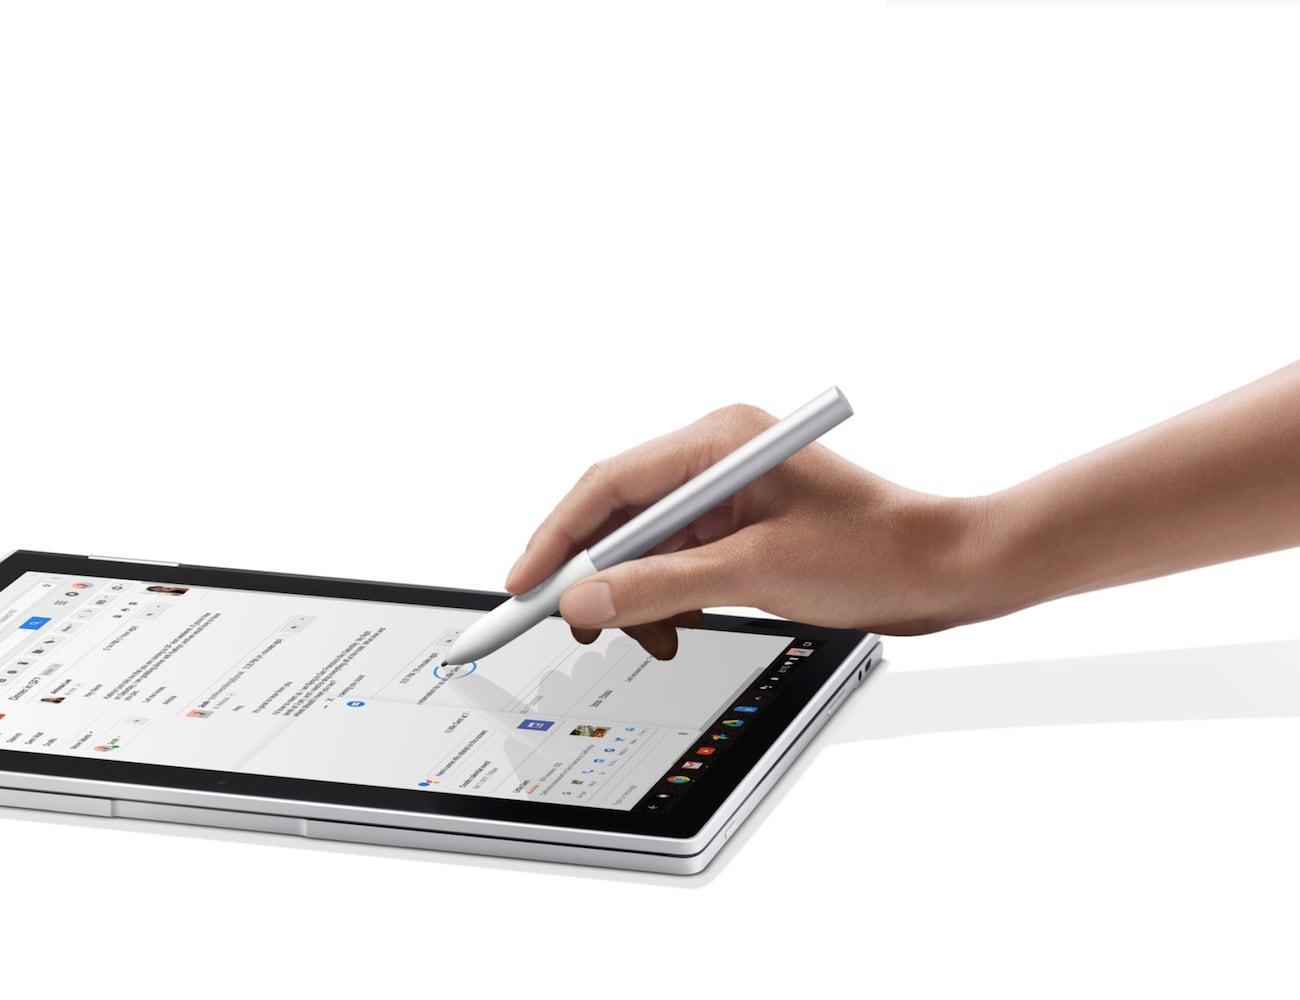 Google Pixelbook Pen Smart Stylus